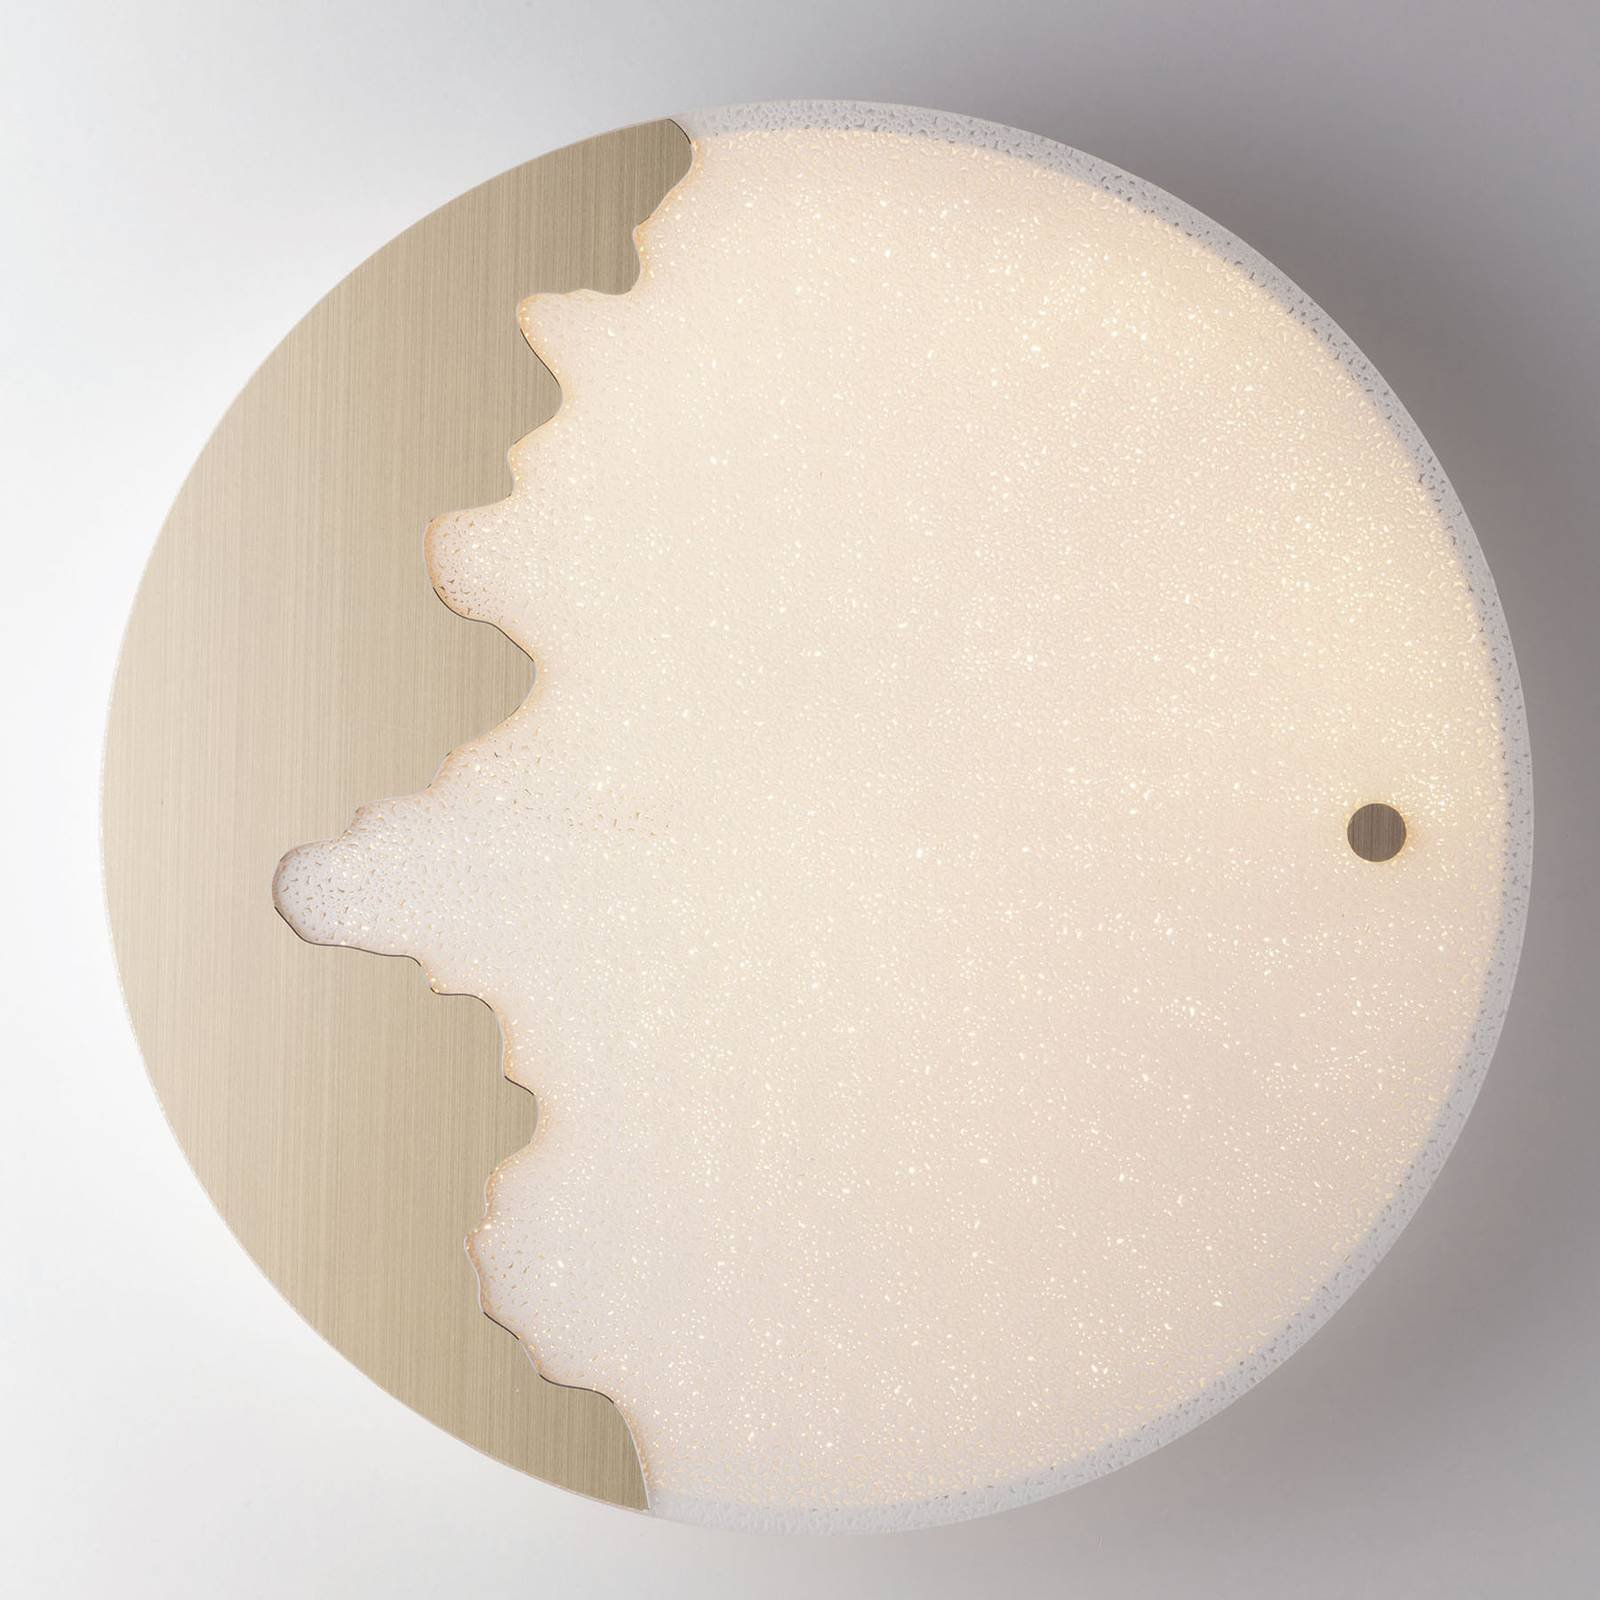 LED-vegglampe Chic Tuya, rund, gull/relieff Ø60cm